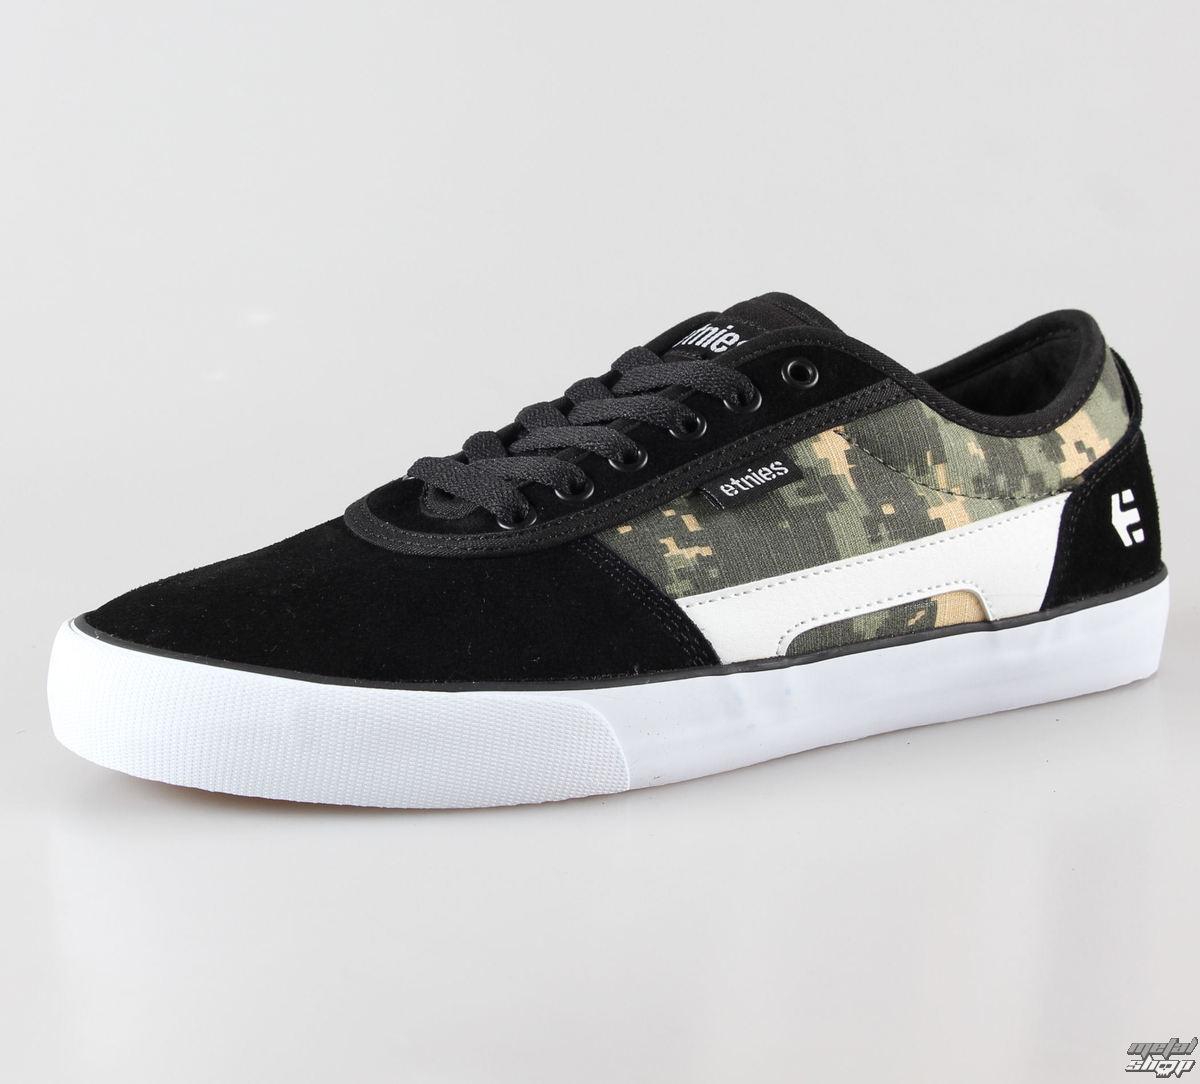 boty pánské ETNIES - RCT - Black/Camo